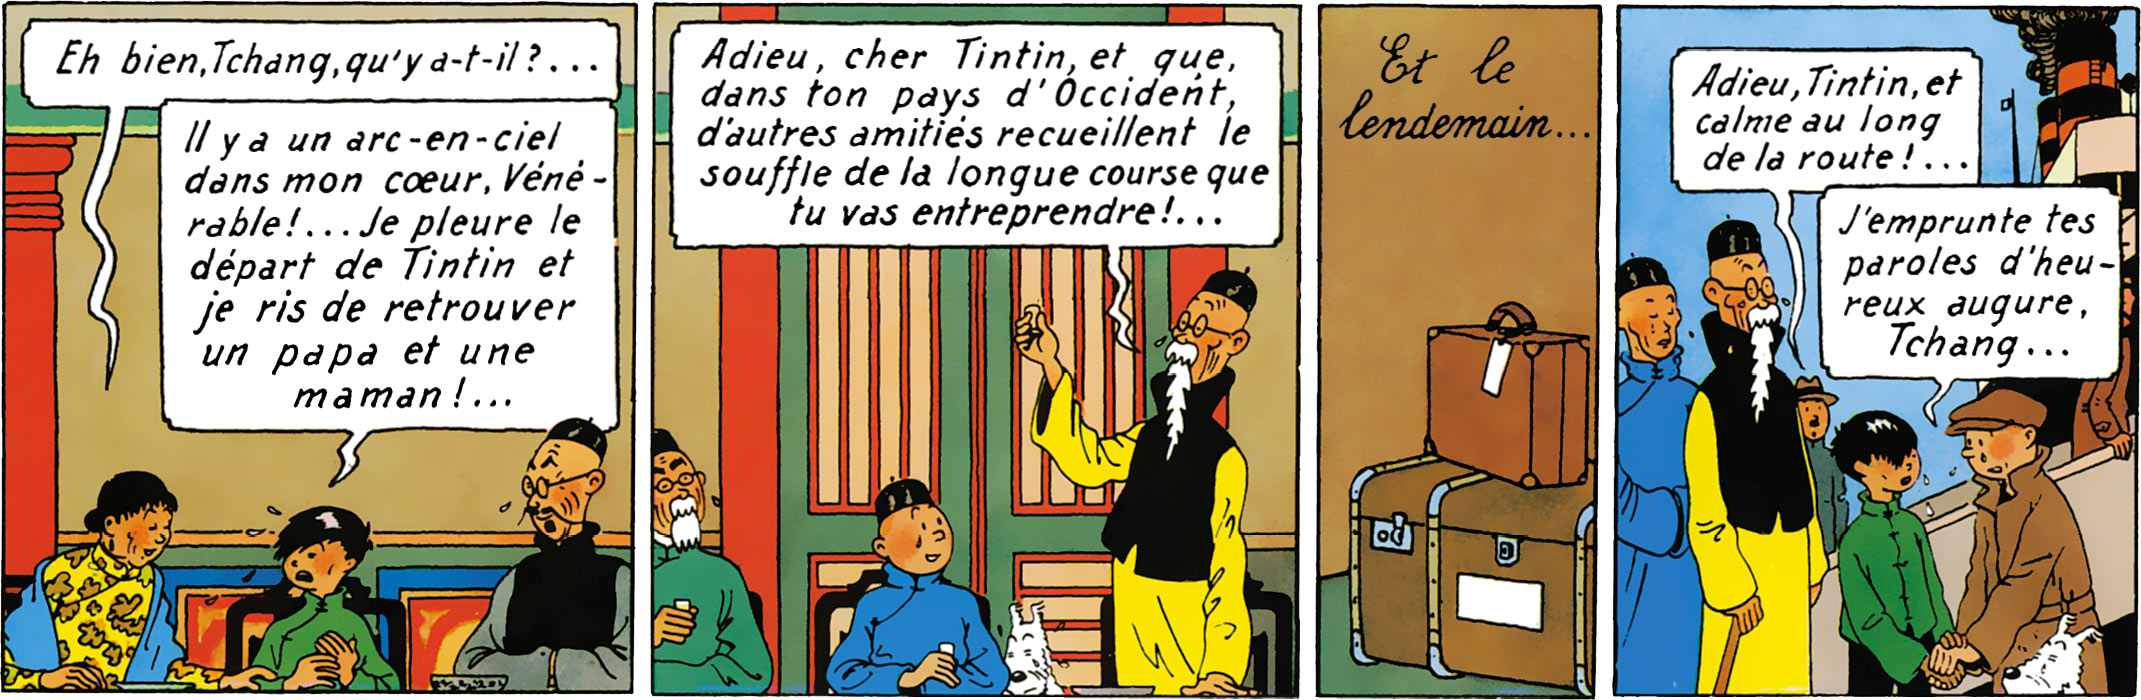 Fin du Lotus bleu Tintin dit au revoir à Tchang